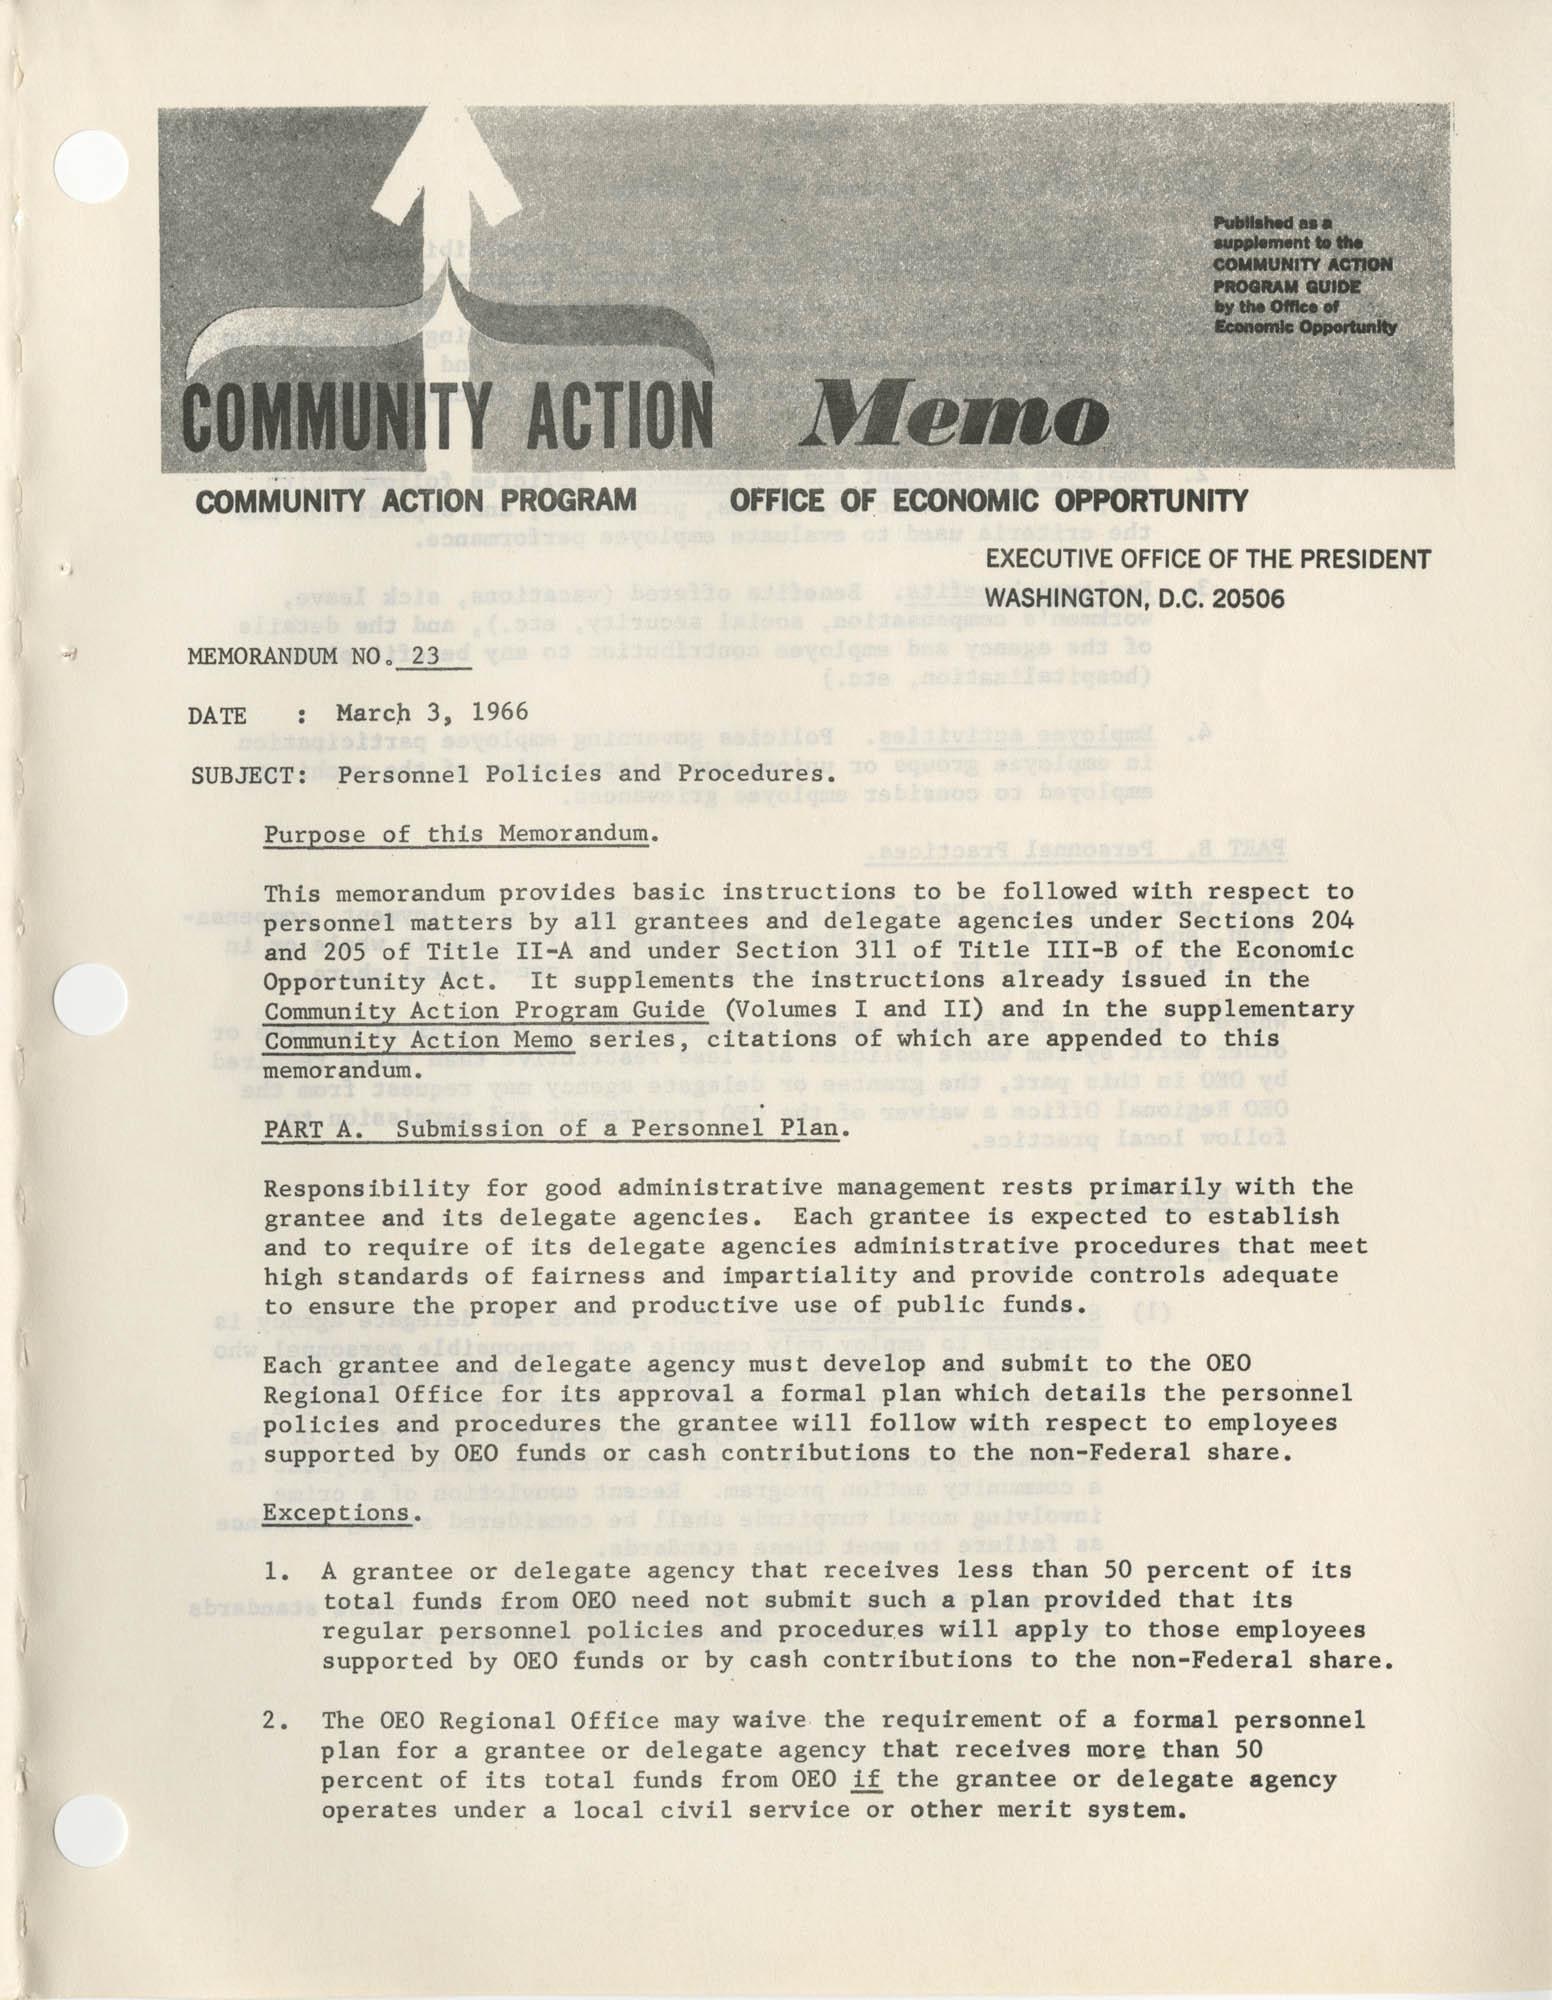 Community Action Program Memorandum No. 23, Memo Page 1